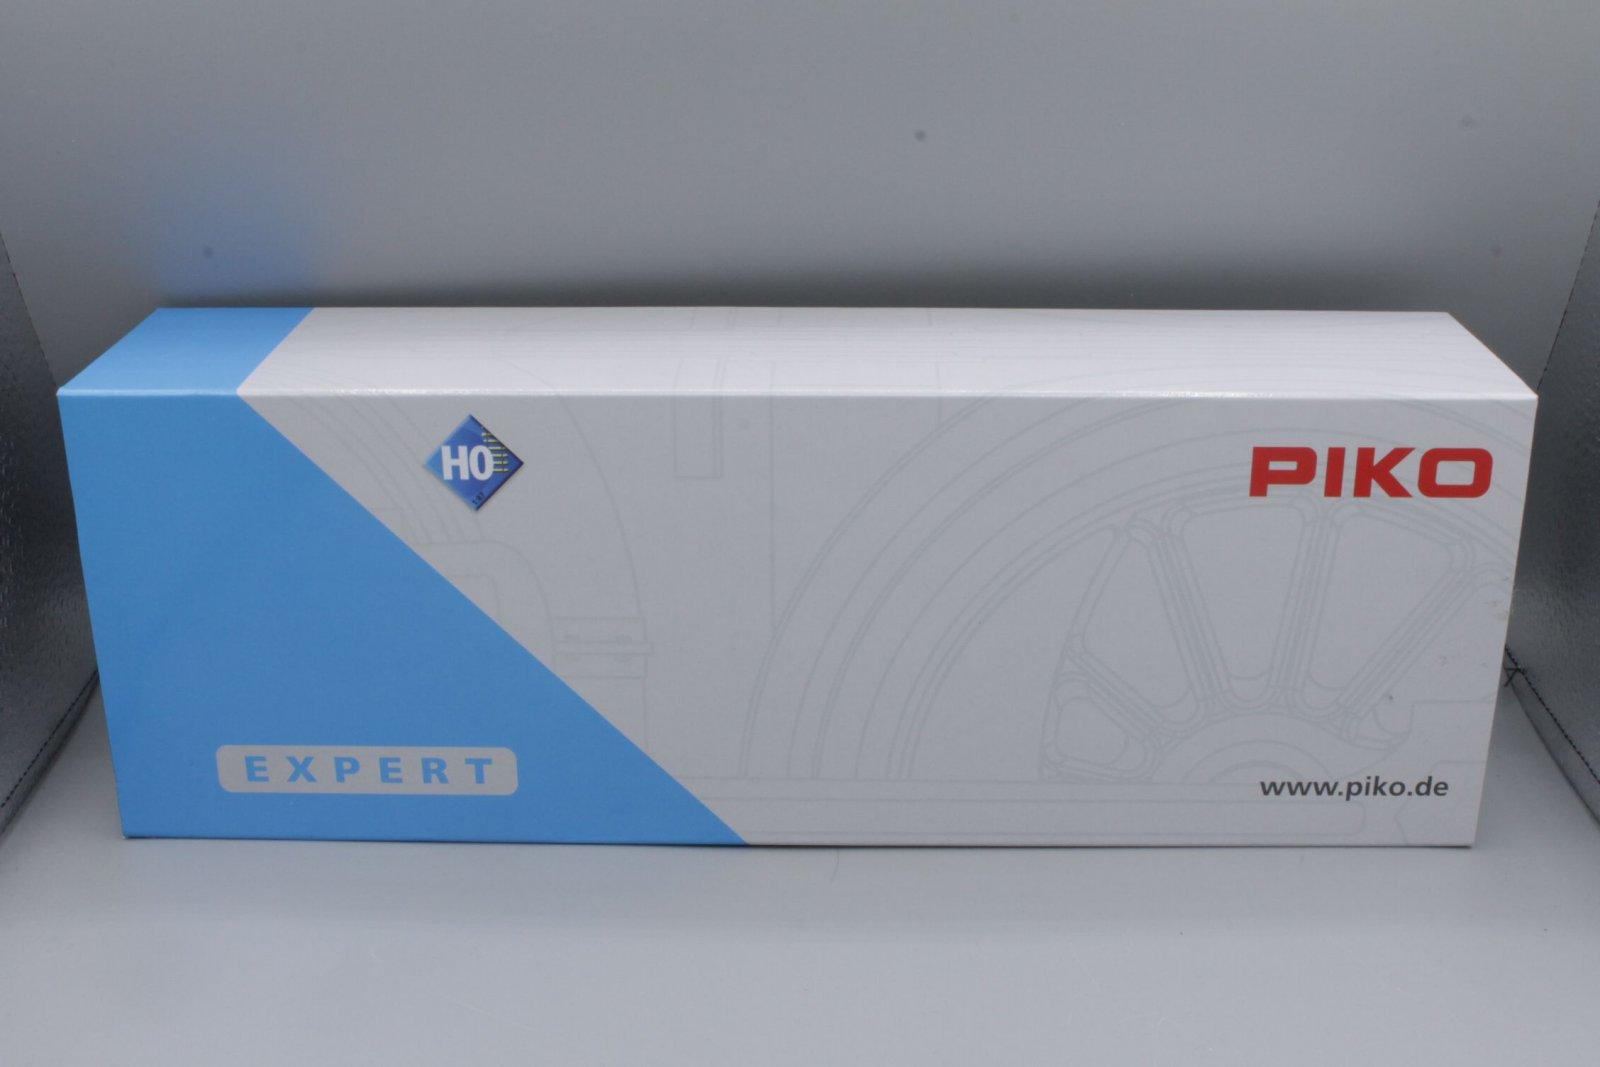 Ersatzteil Piko 118 Leerverpackung - Piko blau / grau